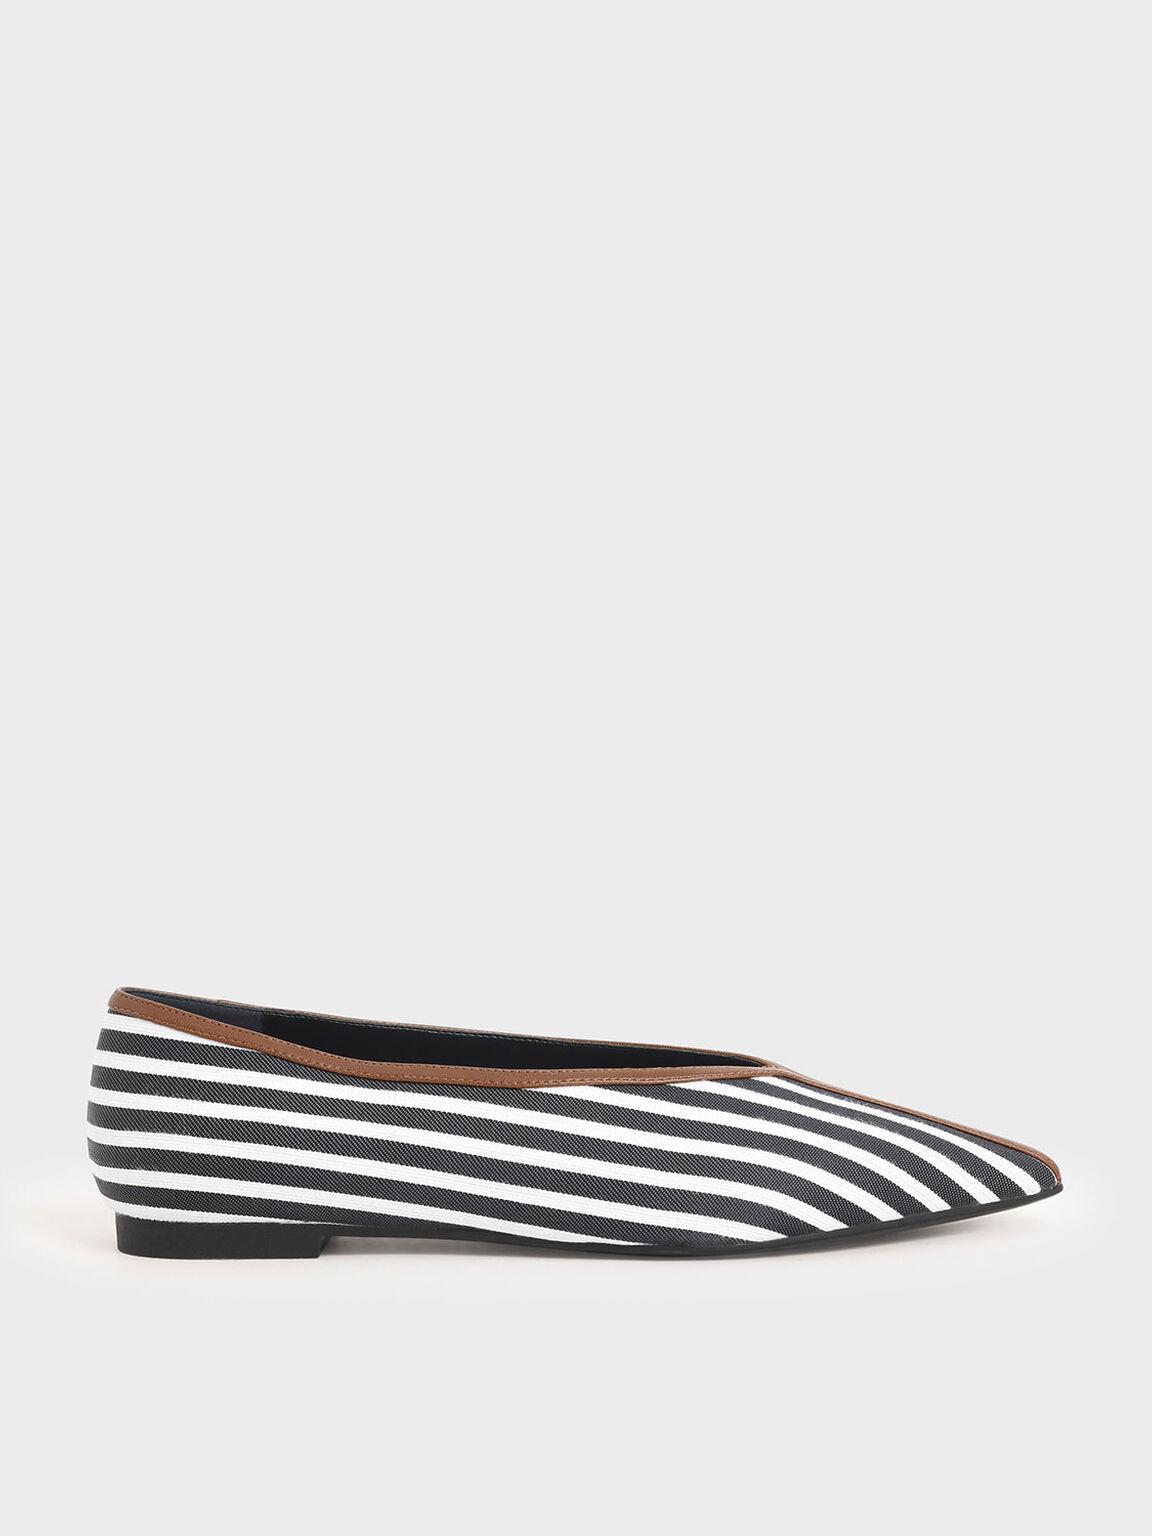 Jacquard Striped V-Cut Ballerina Flats, Dark Blue, hi-res